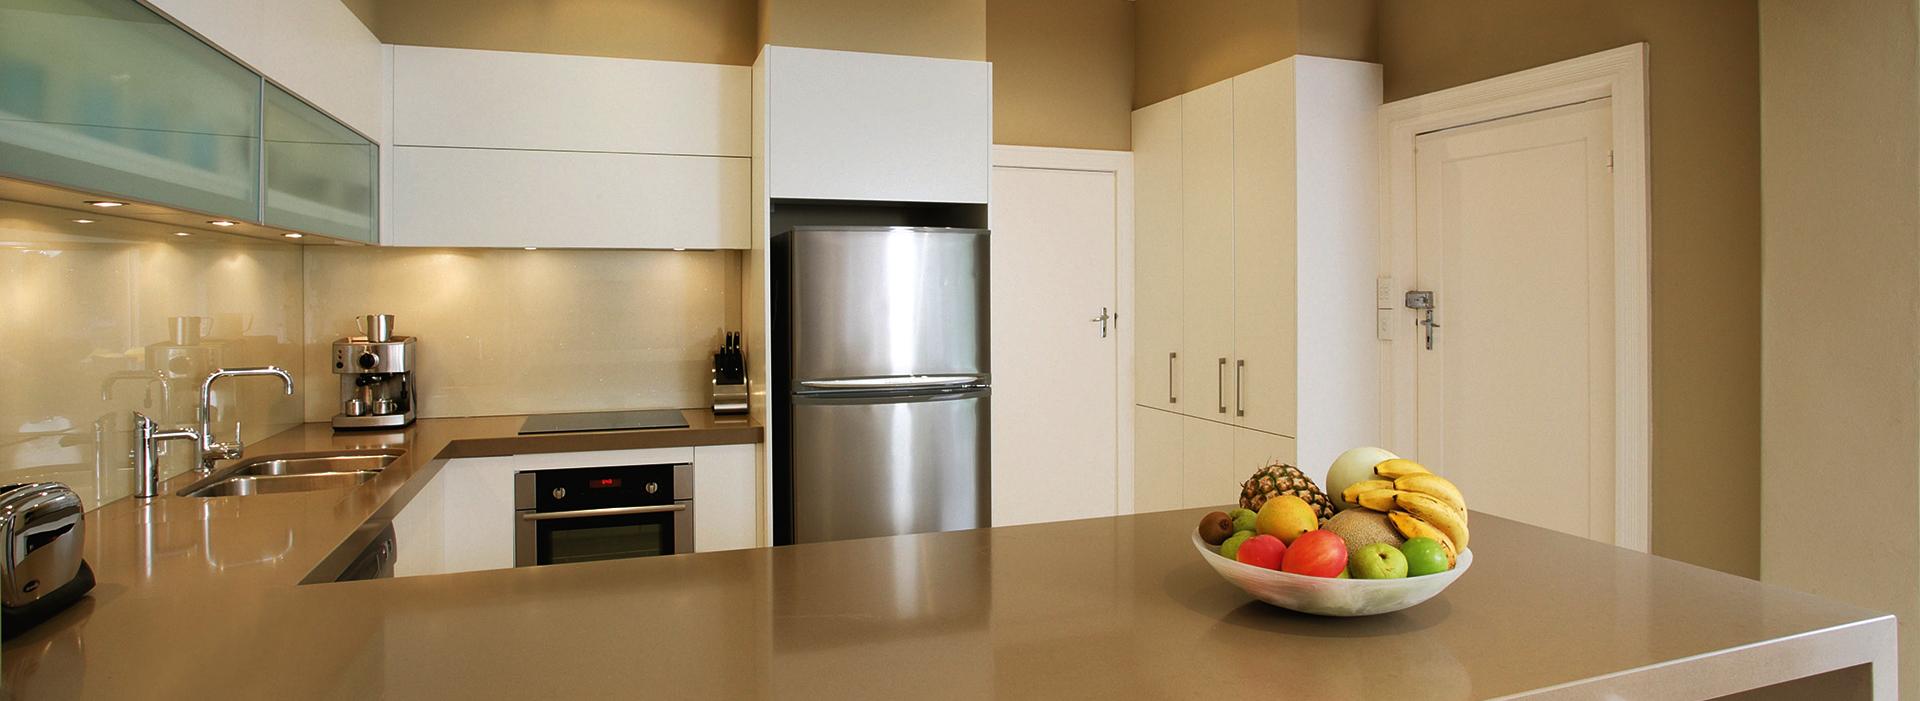 Interior habitacion muebles home antecedentes Moderno Cocina ...